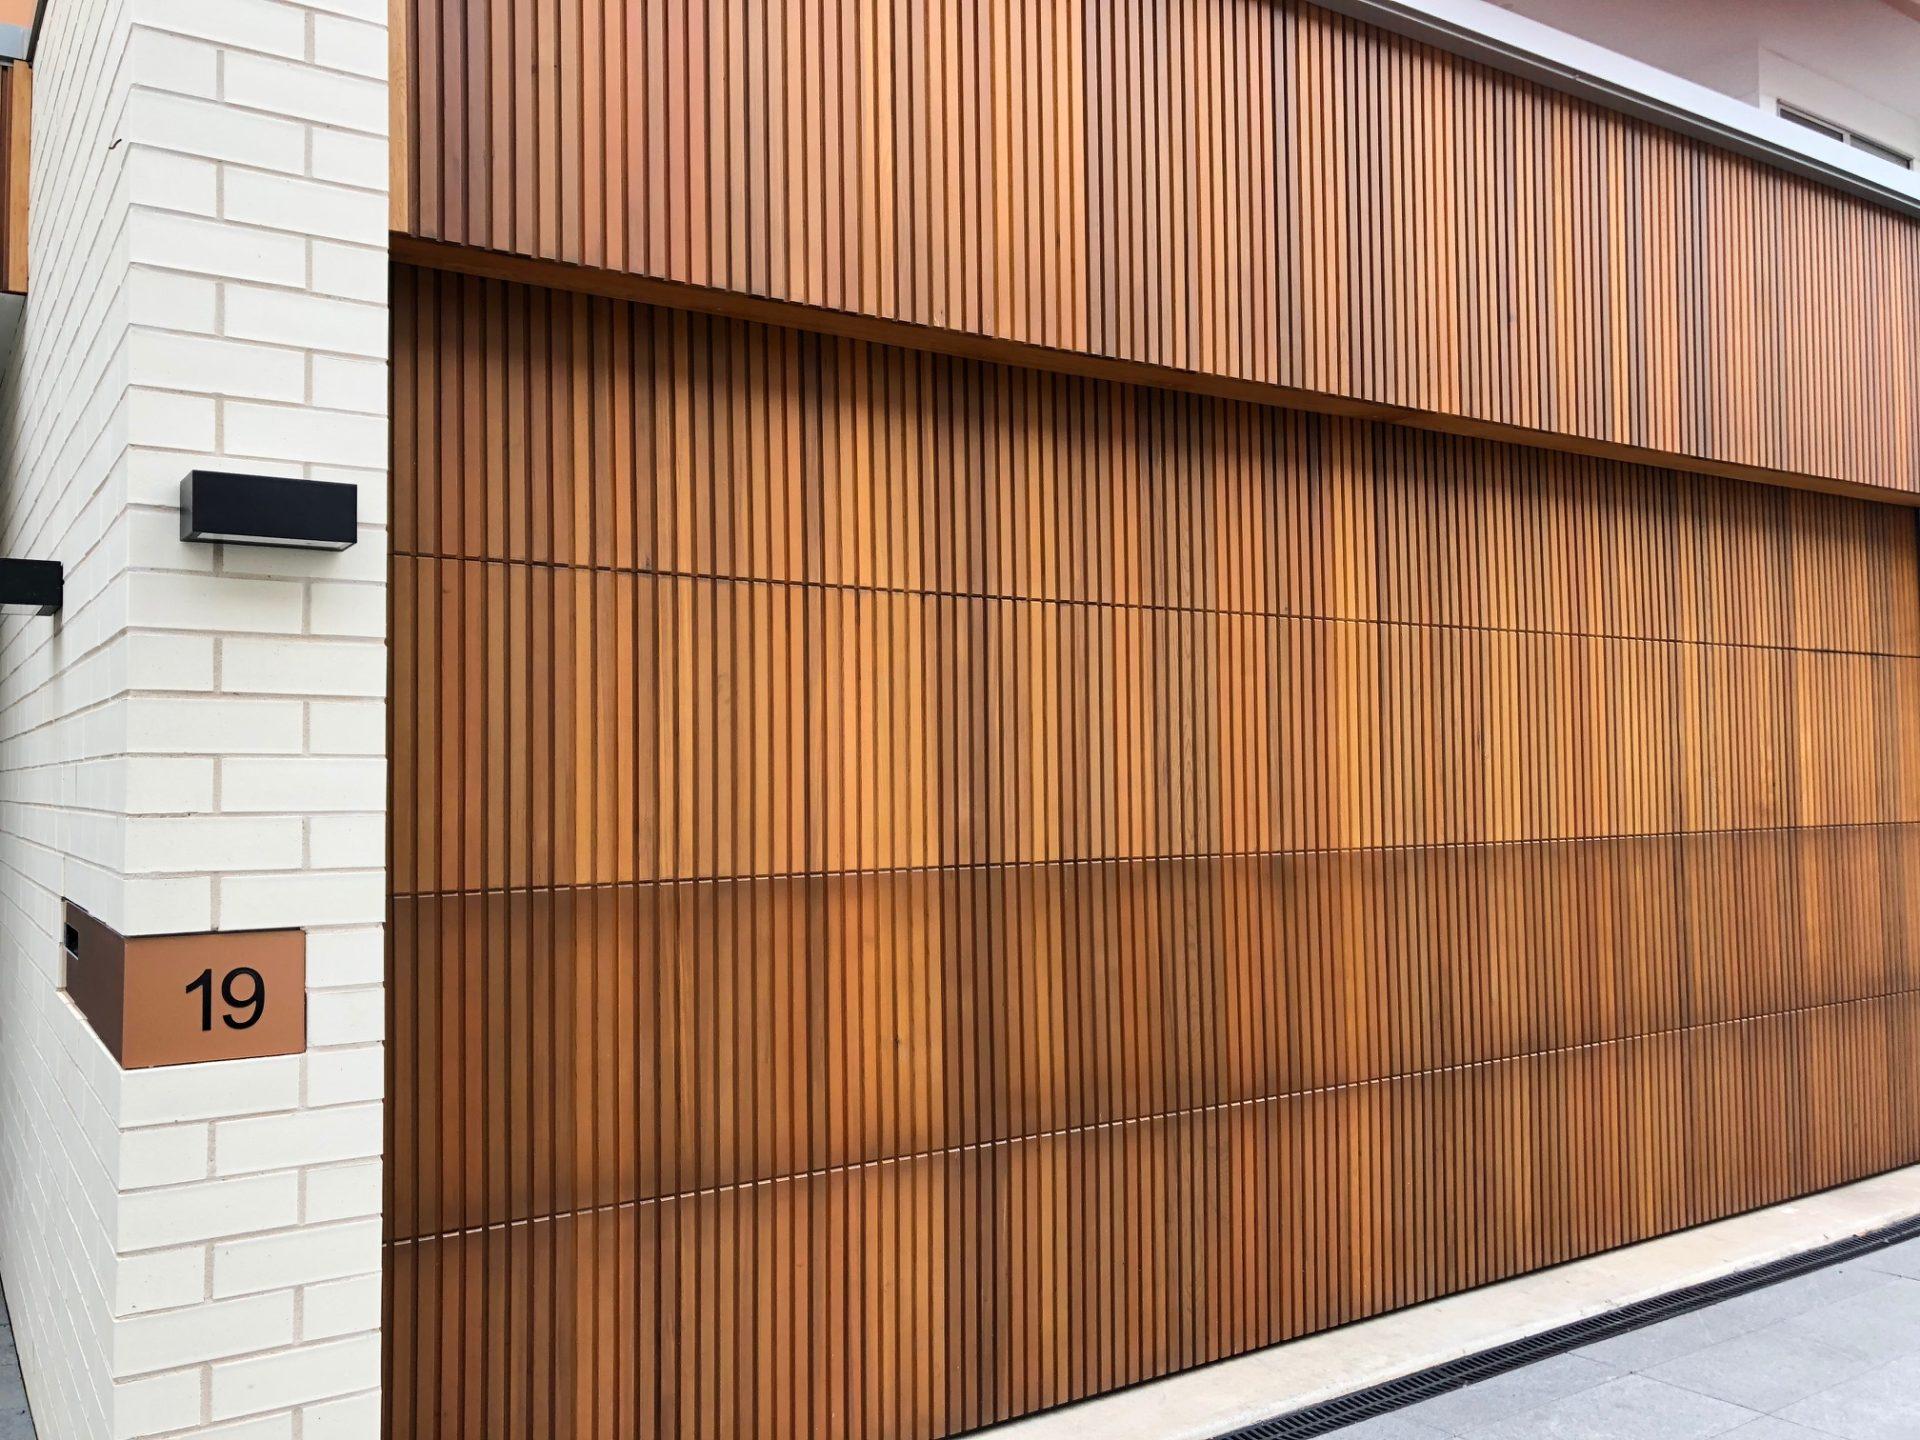 A wall made from cedar wood